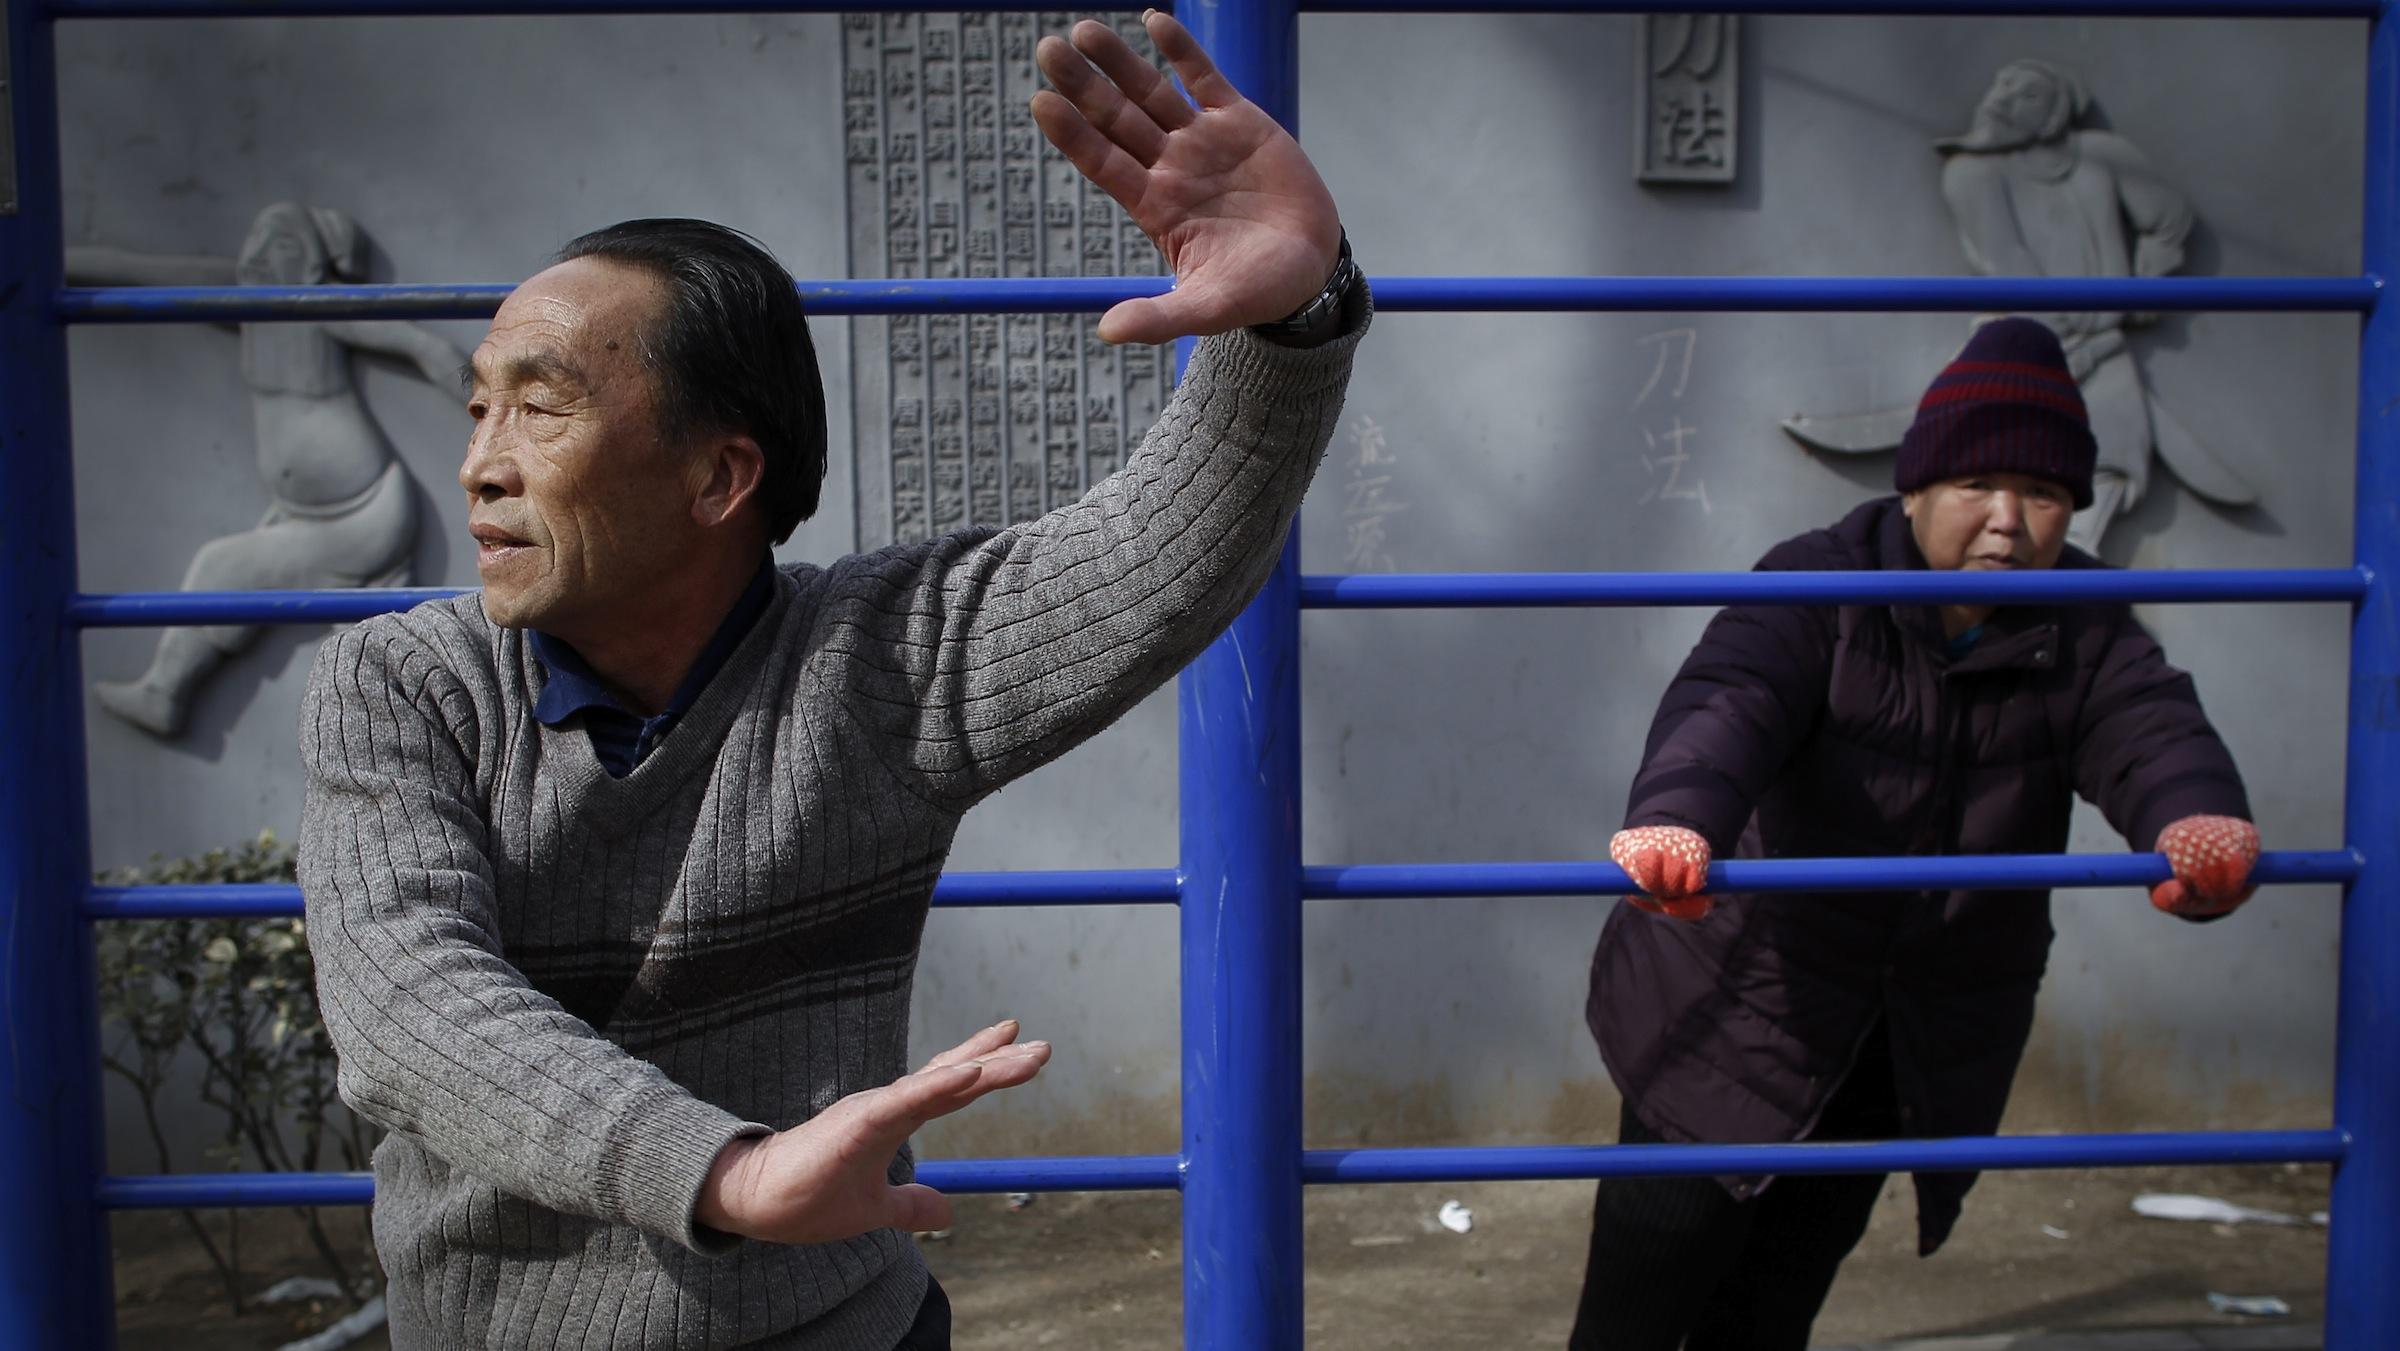 Elderly Chinese doing exercise